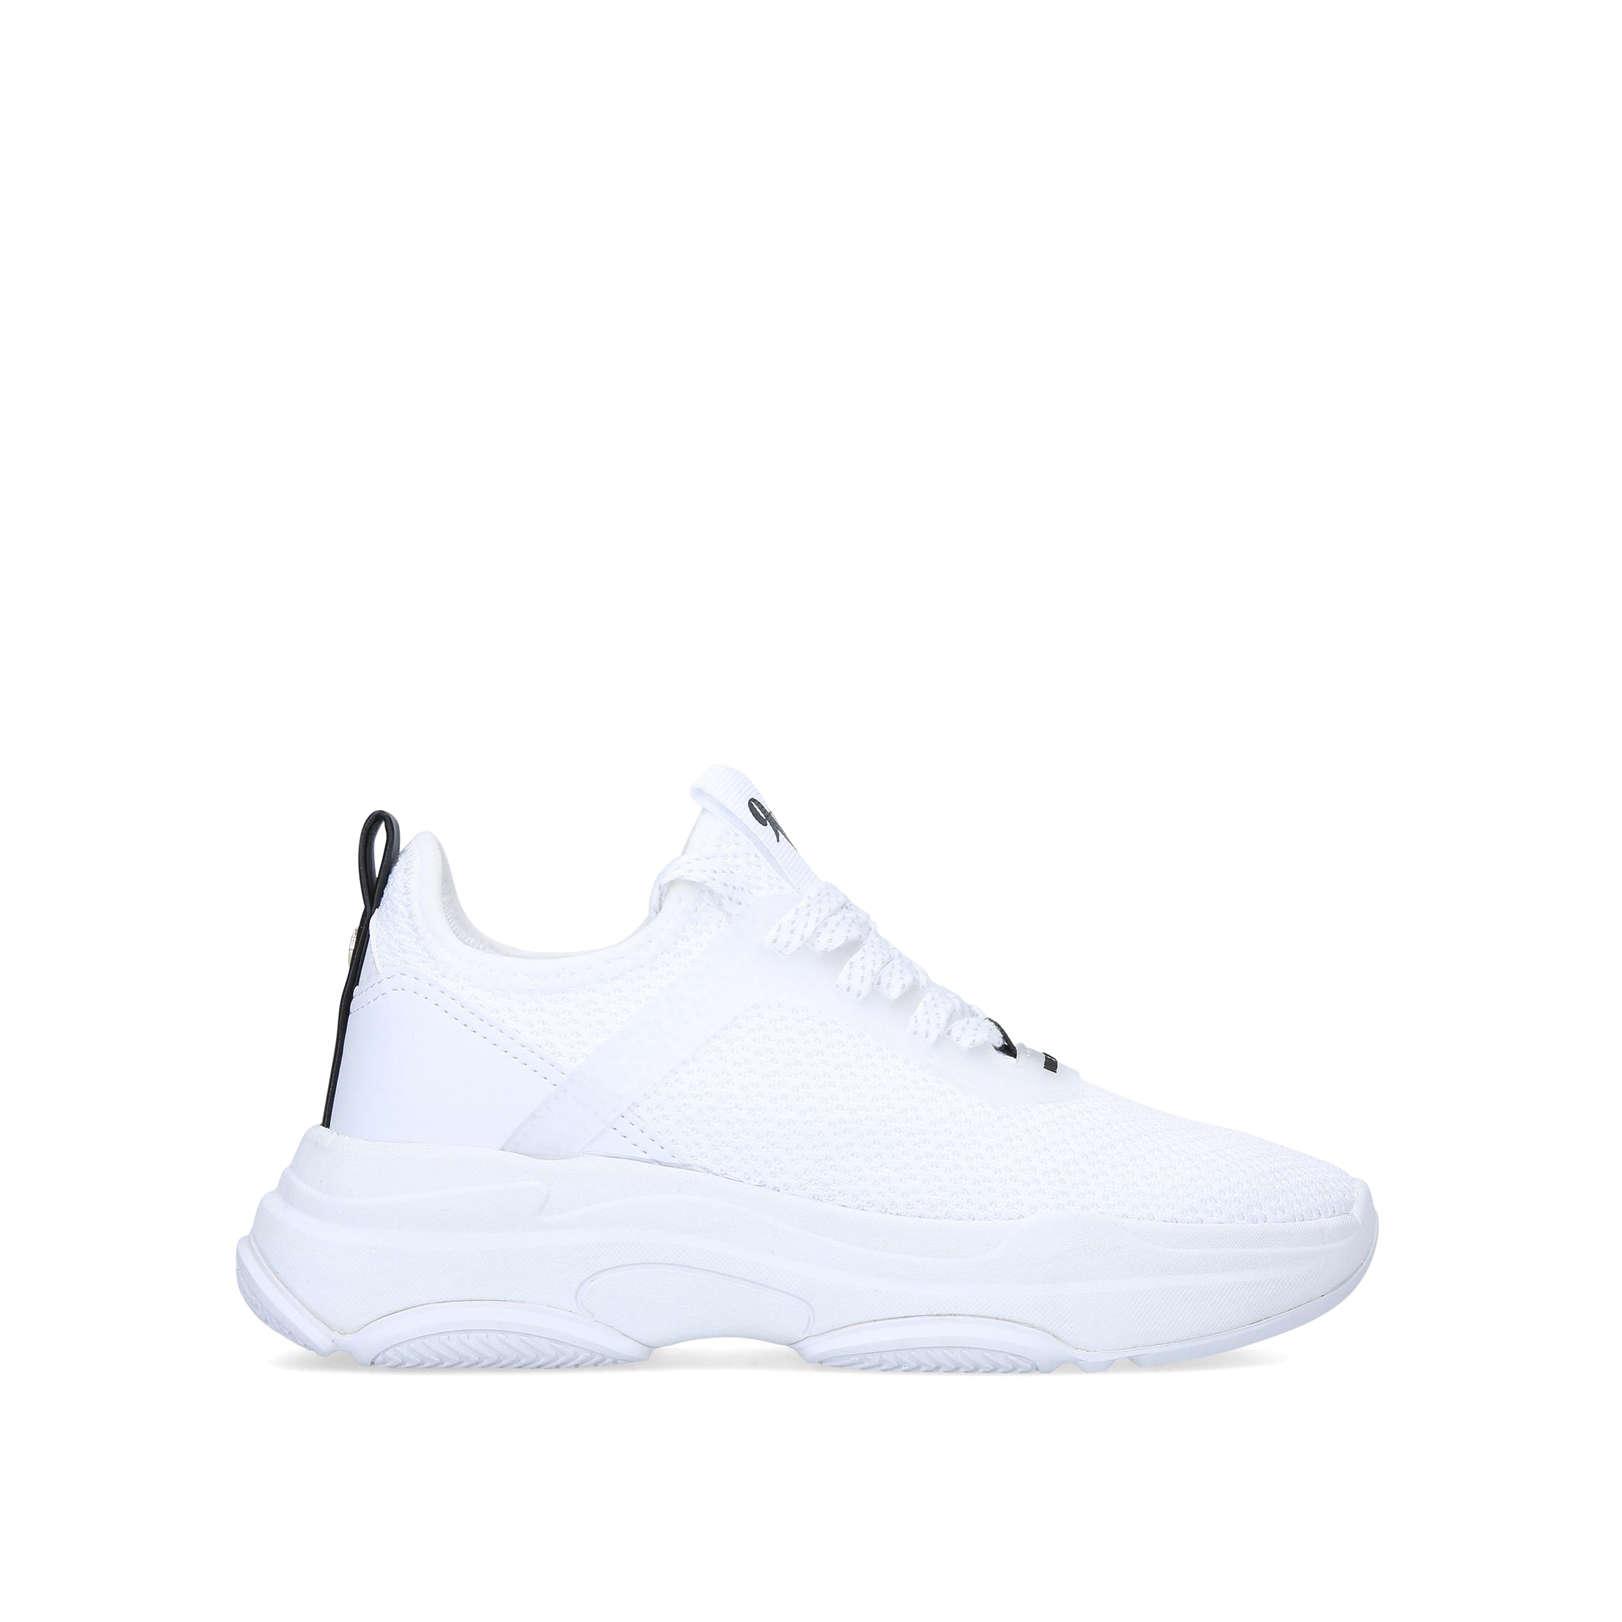 NORLA - NINE WEST Sneakers